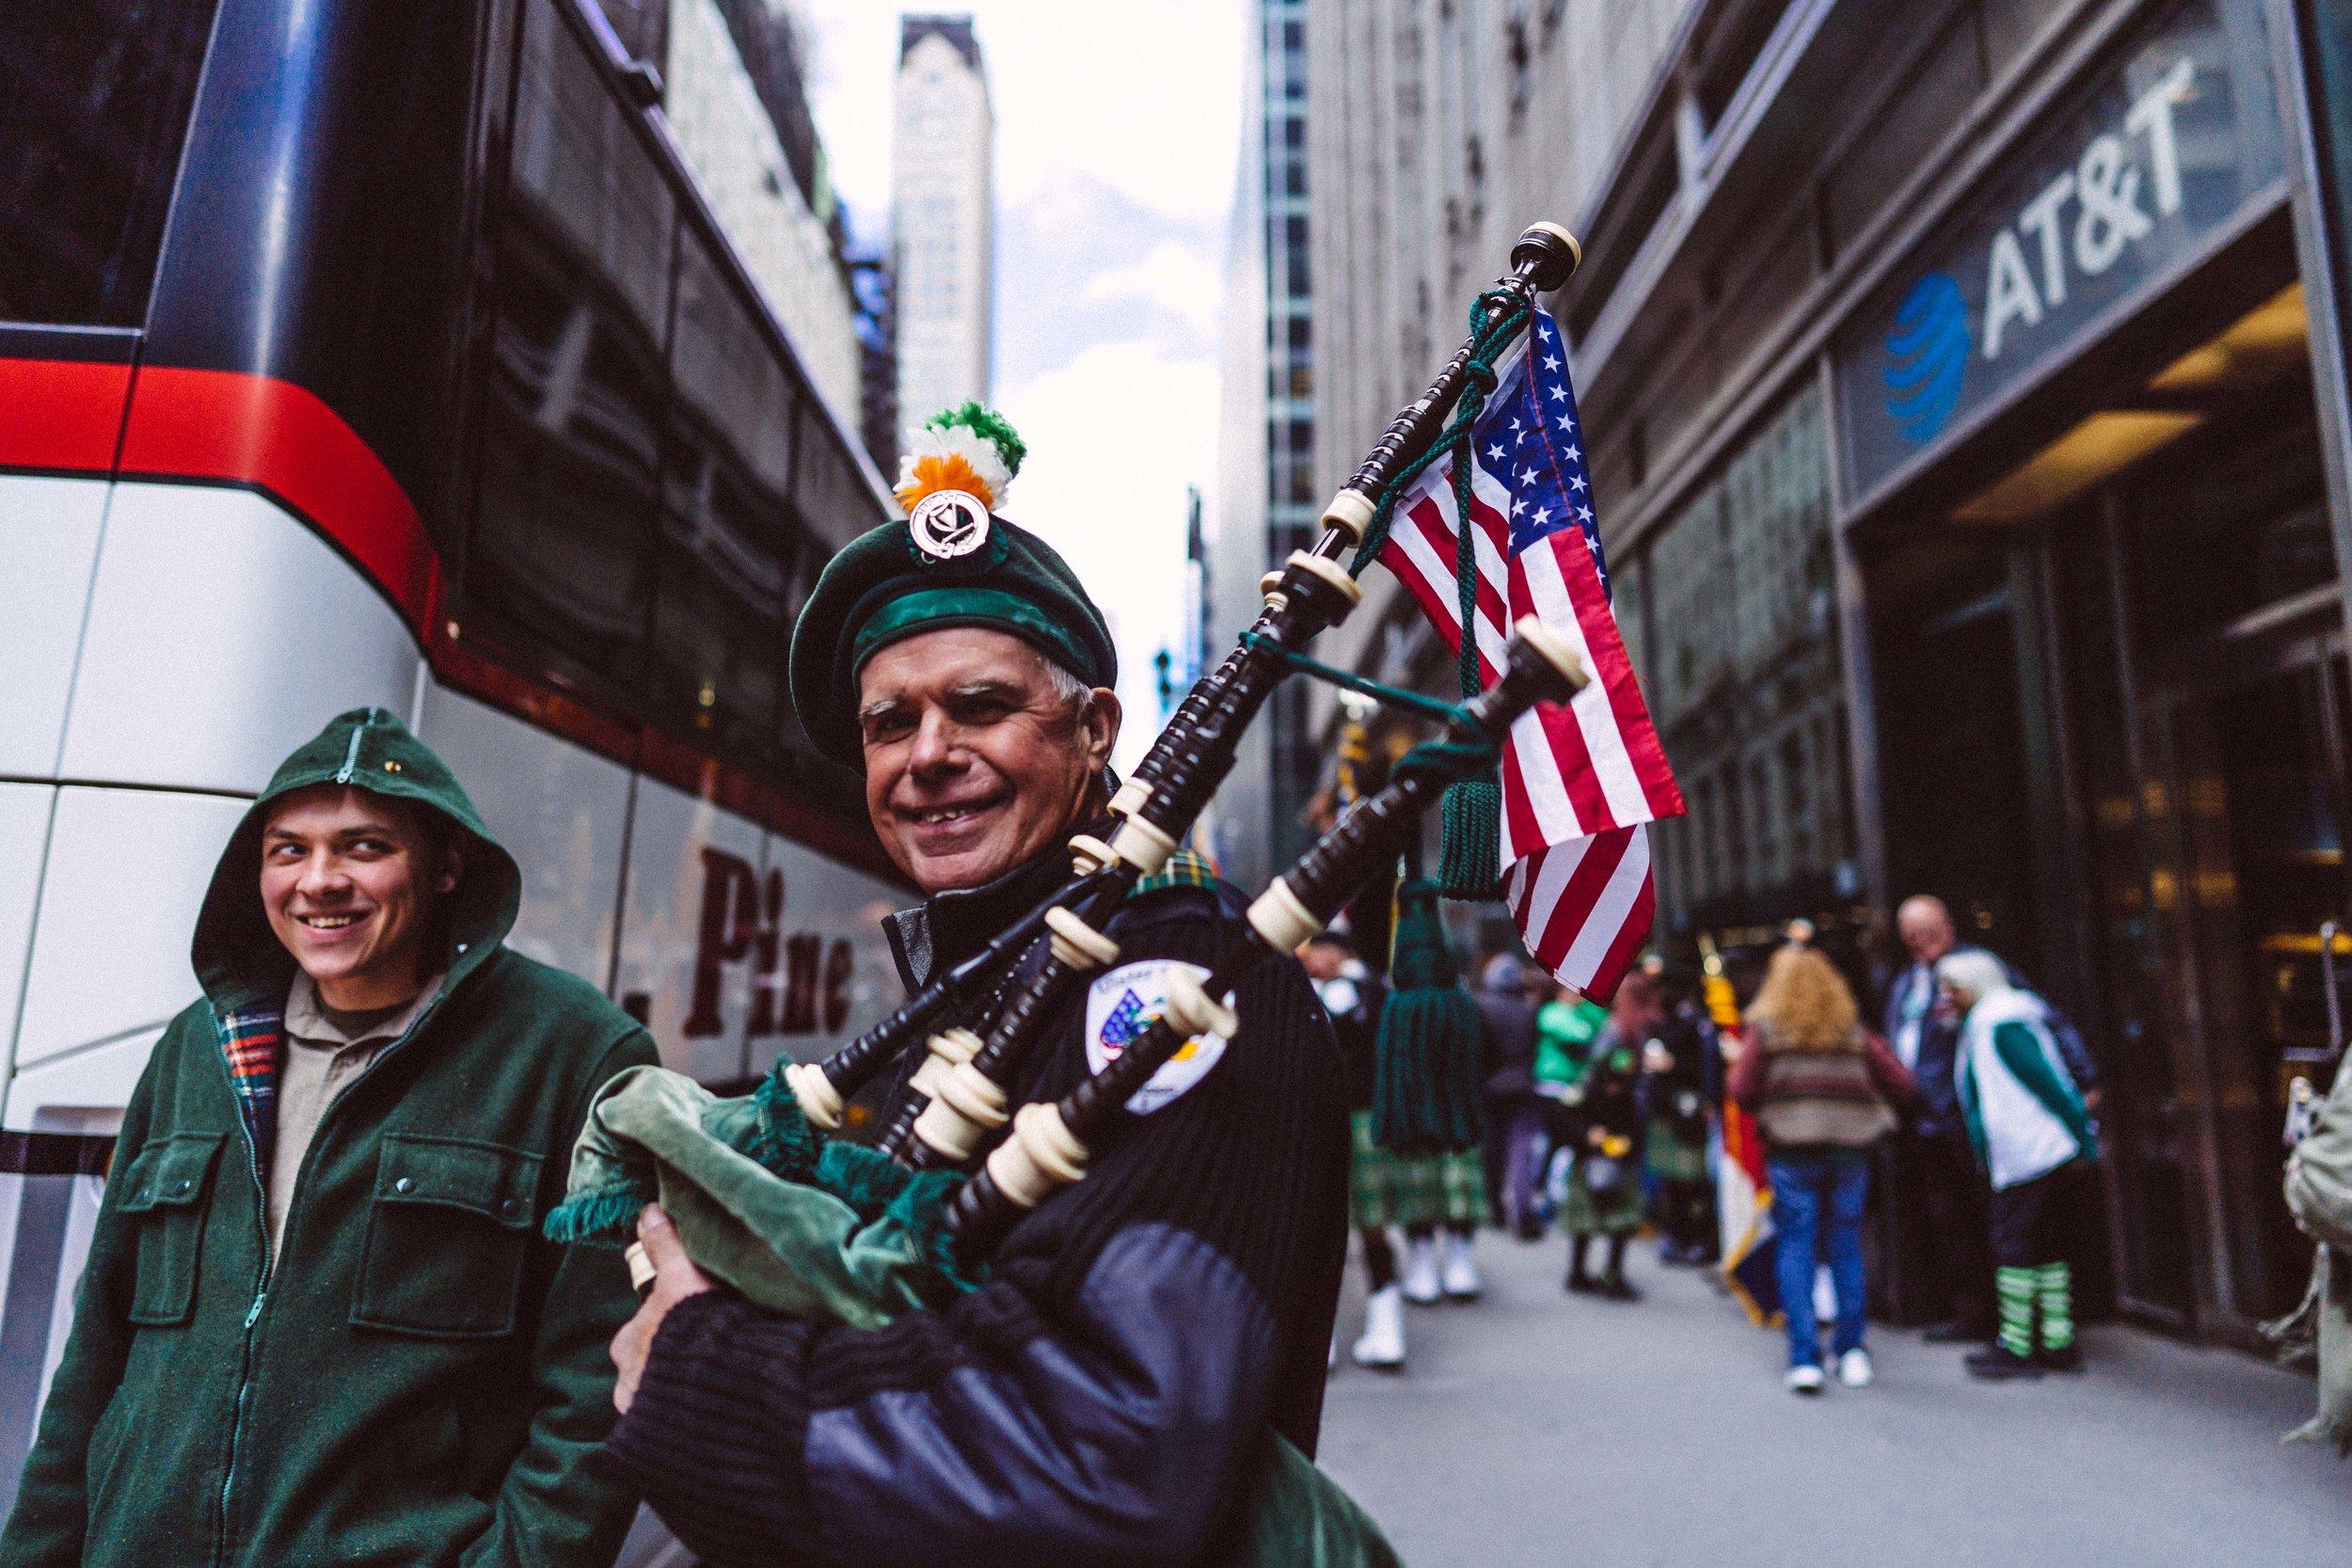 newyork-sony-103031.jpg